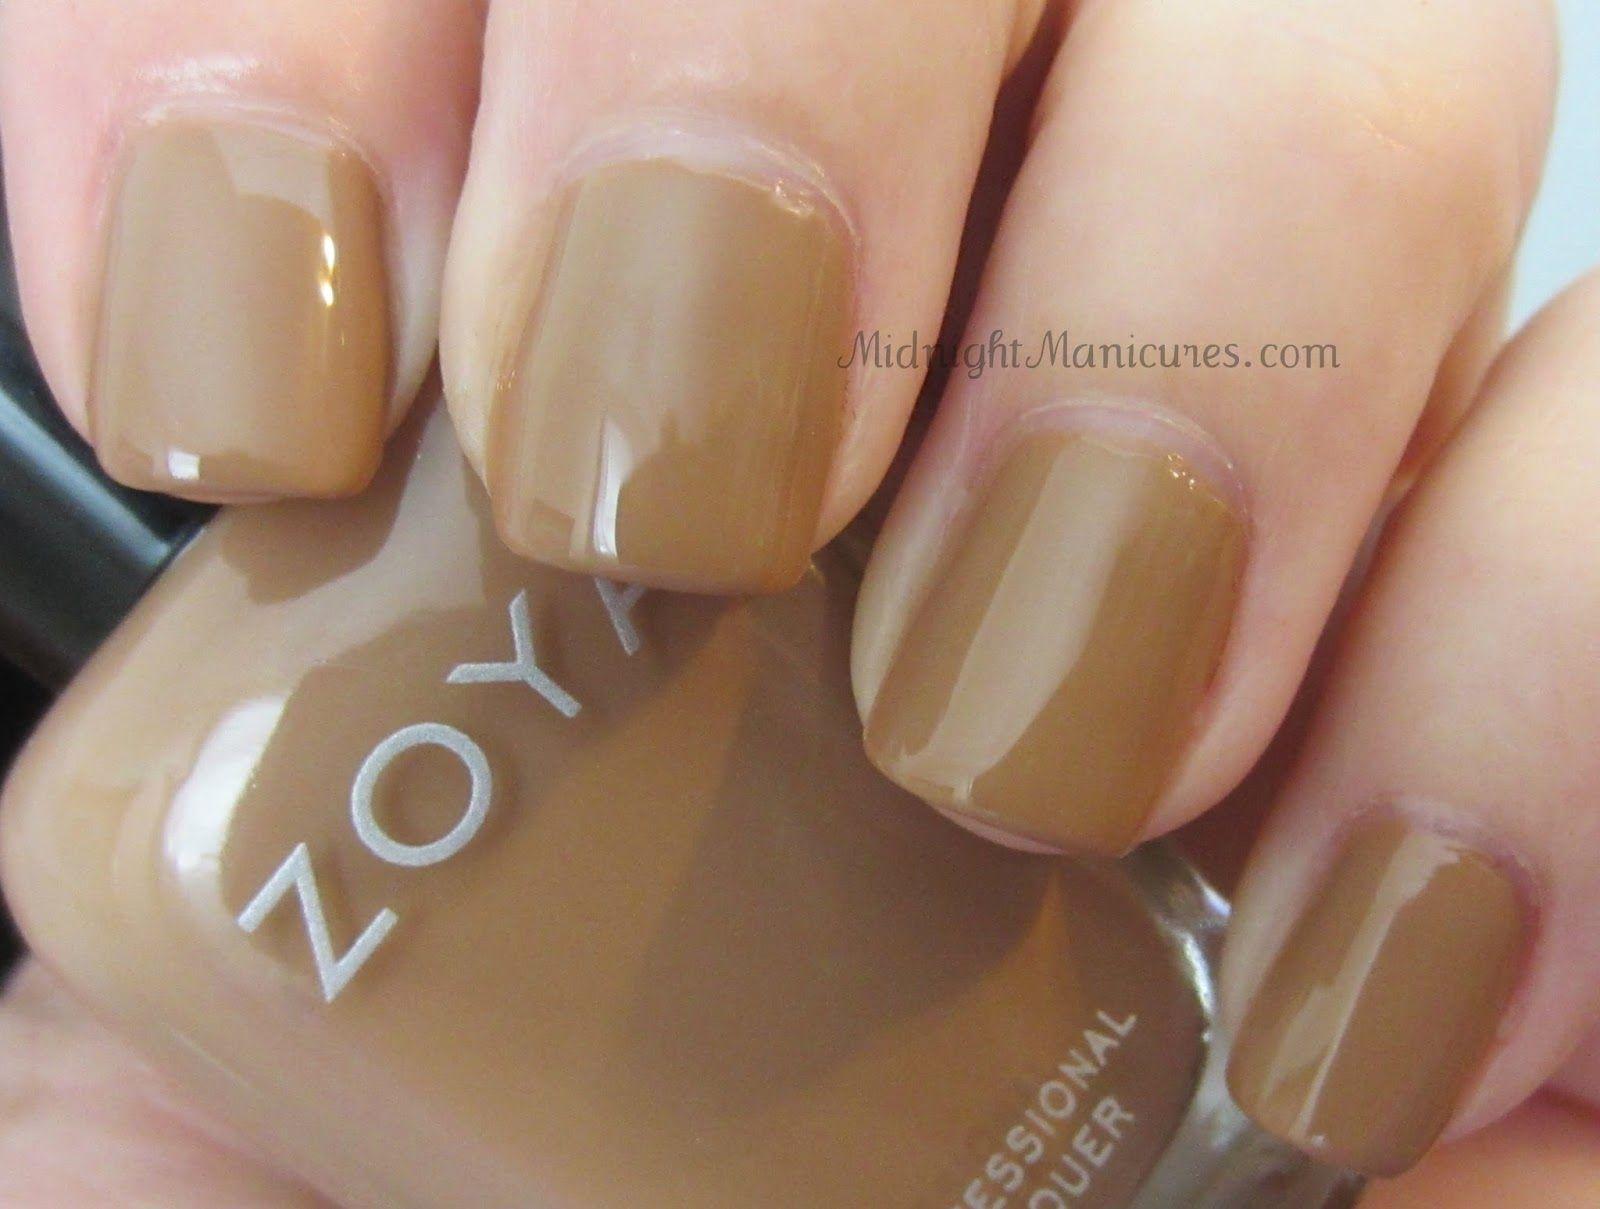 Zoya Cashmere Nail Polish Collection - Review